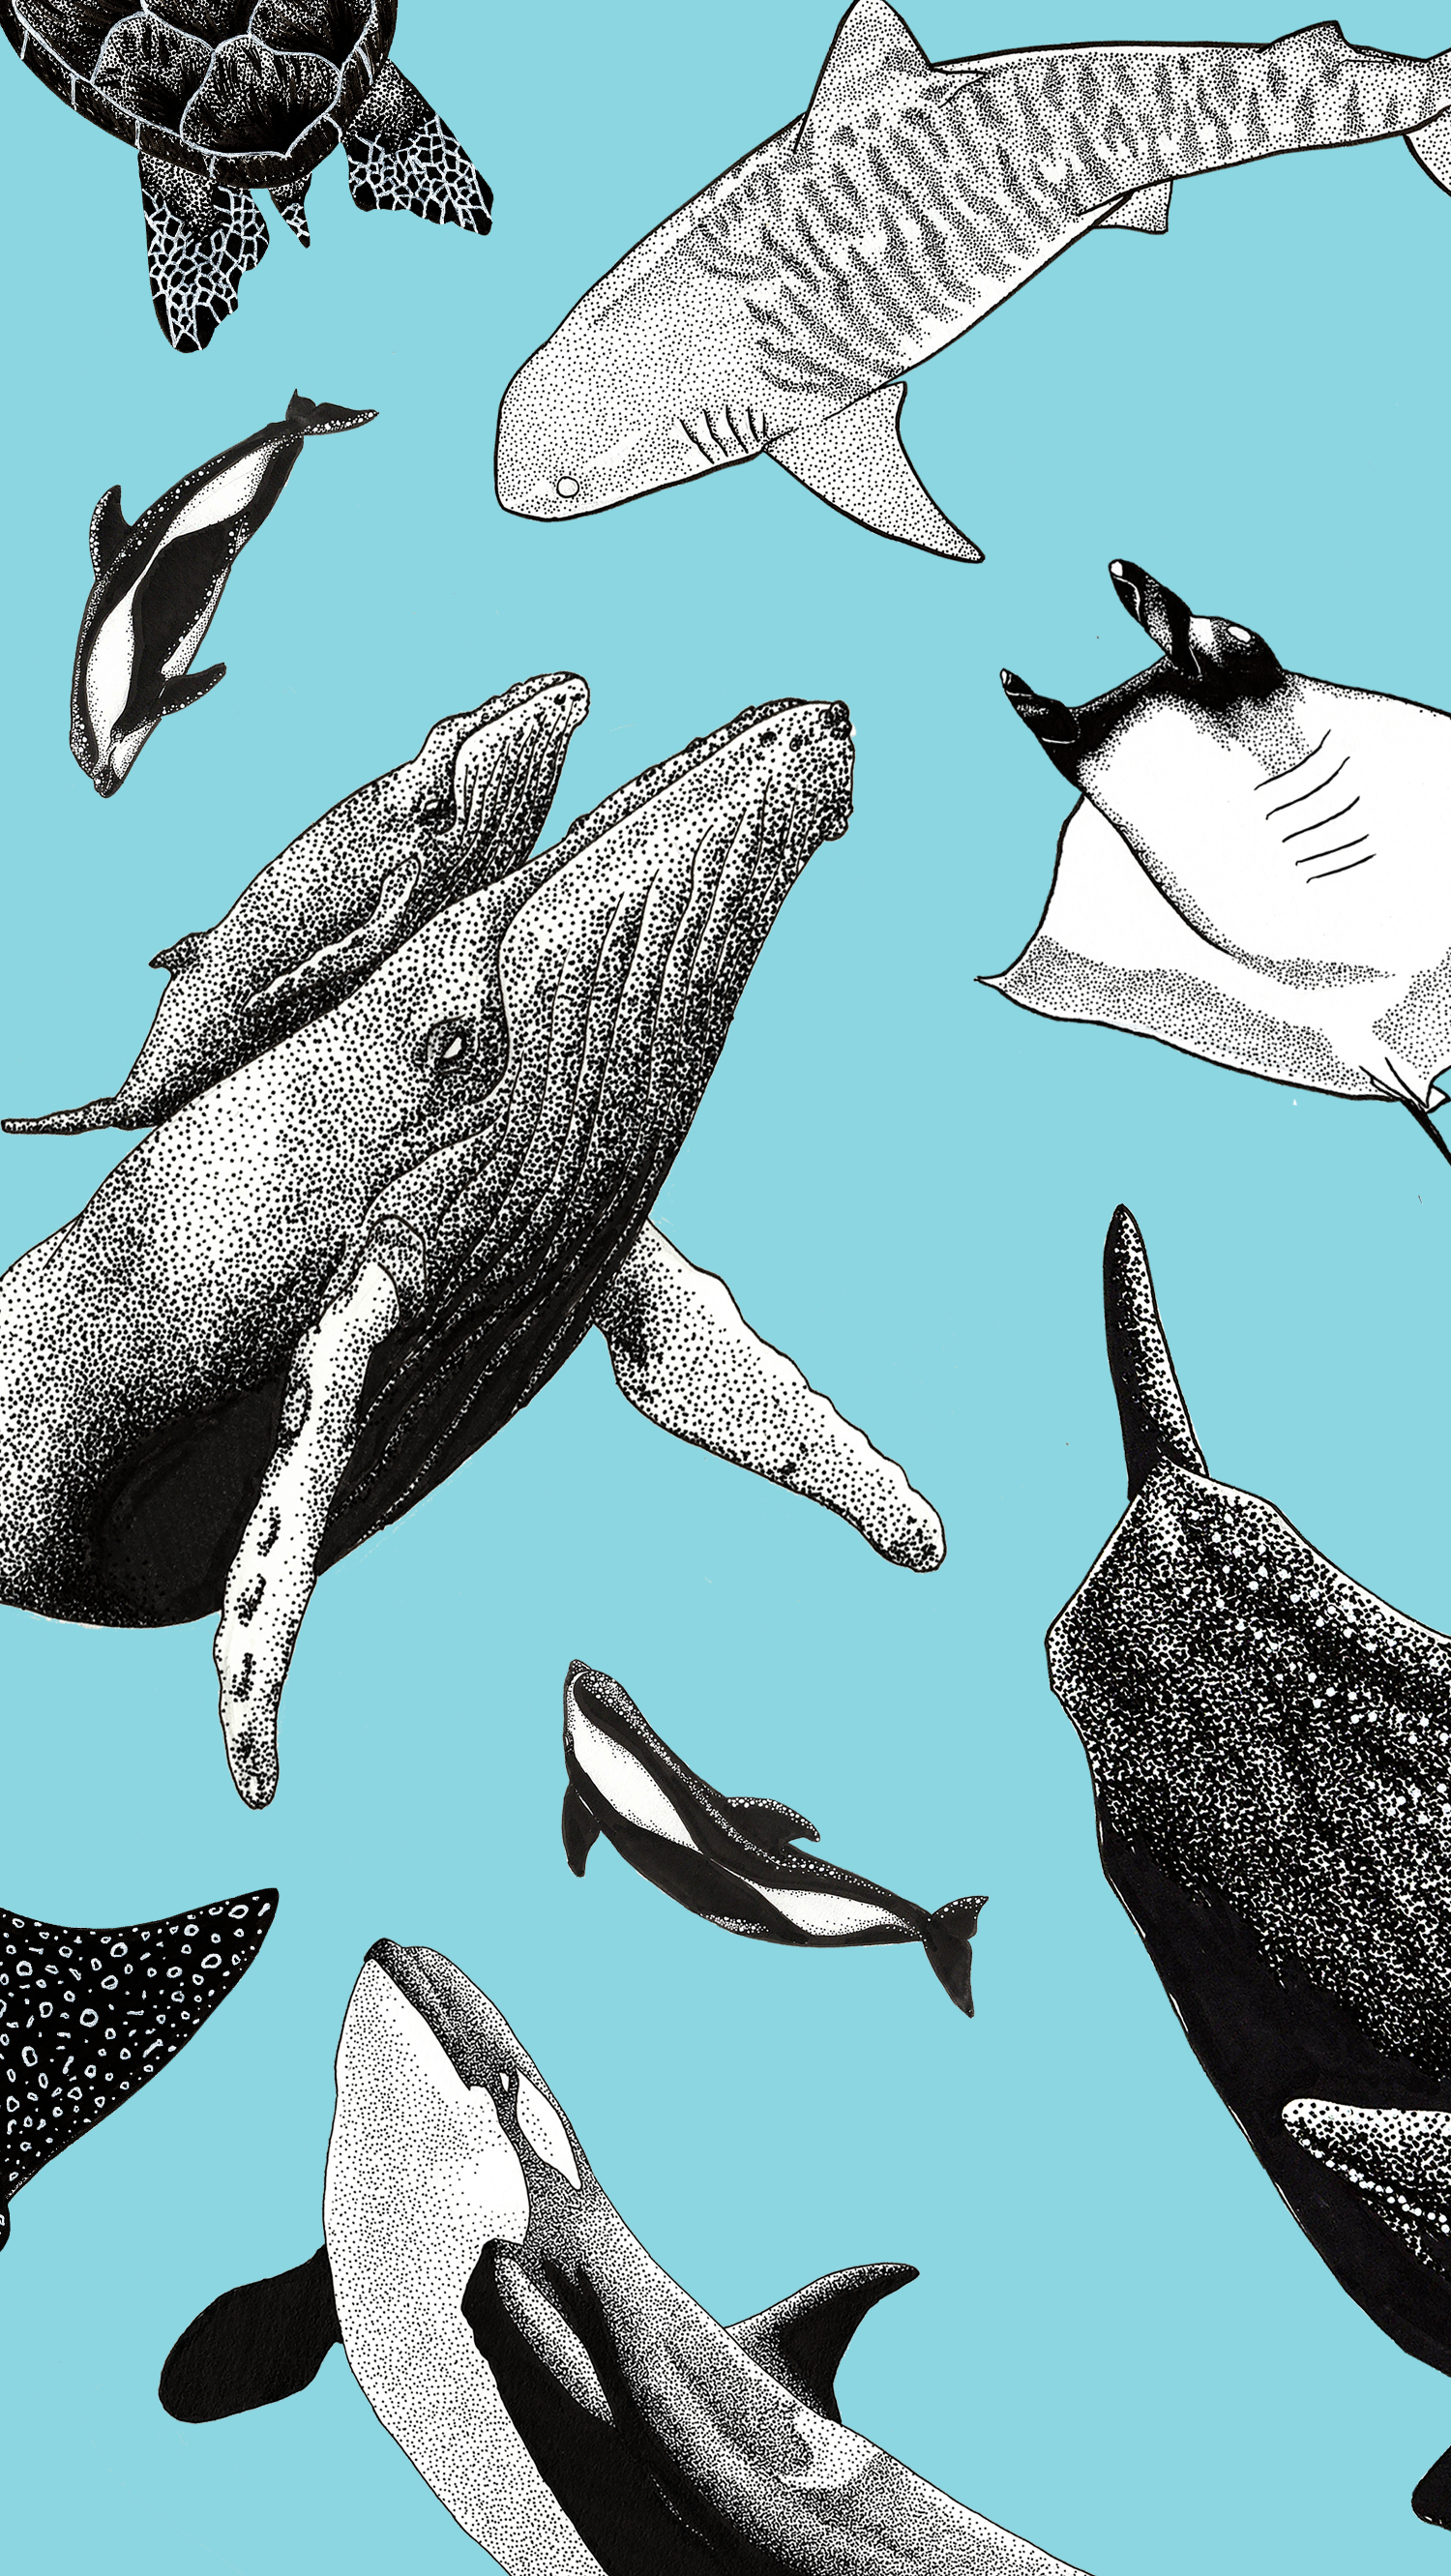 Collage of ocean artwork by Kohola Kai Creative formatted